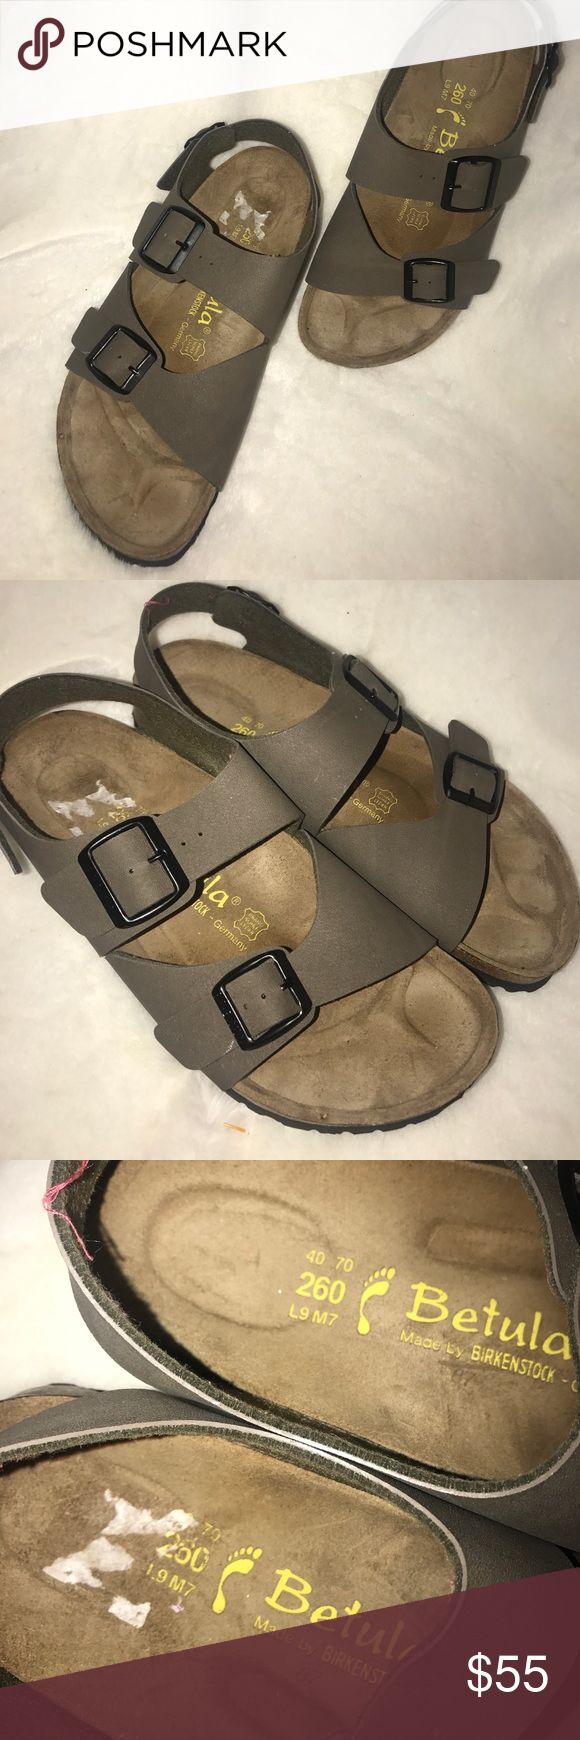 17 Best Ideas About Betula Sandals On Pinterest Brown